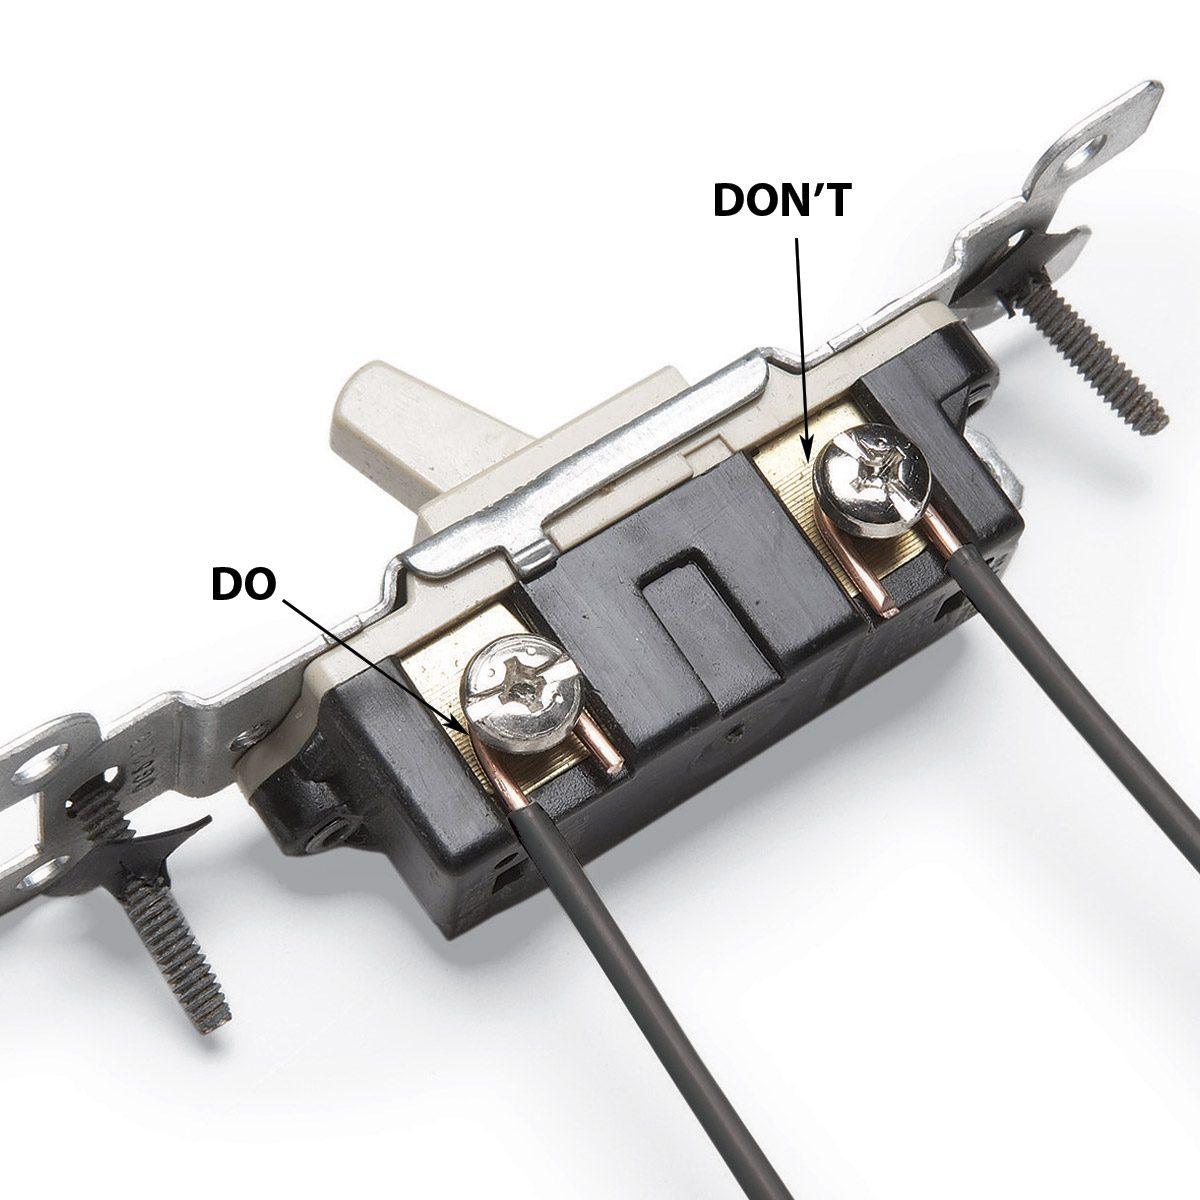 hight resolution of wrap wires clockwise around terminal screws